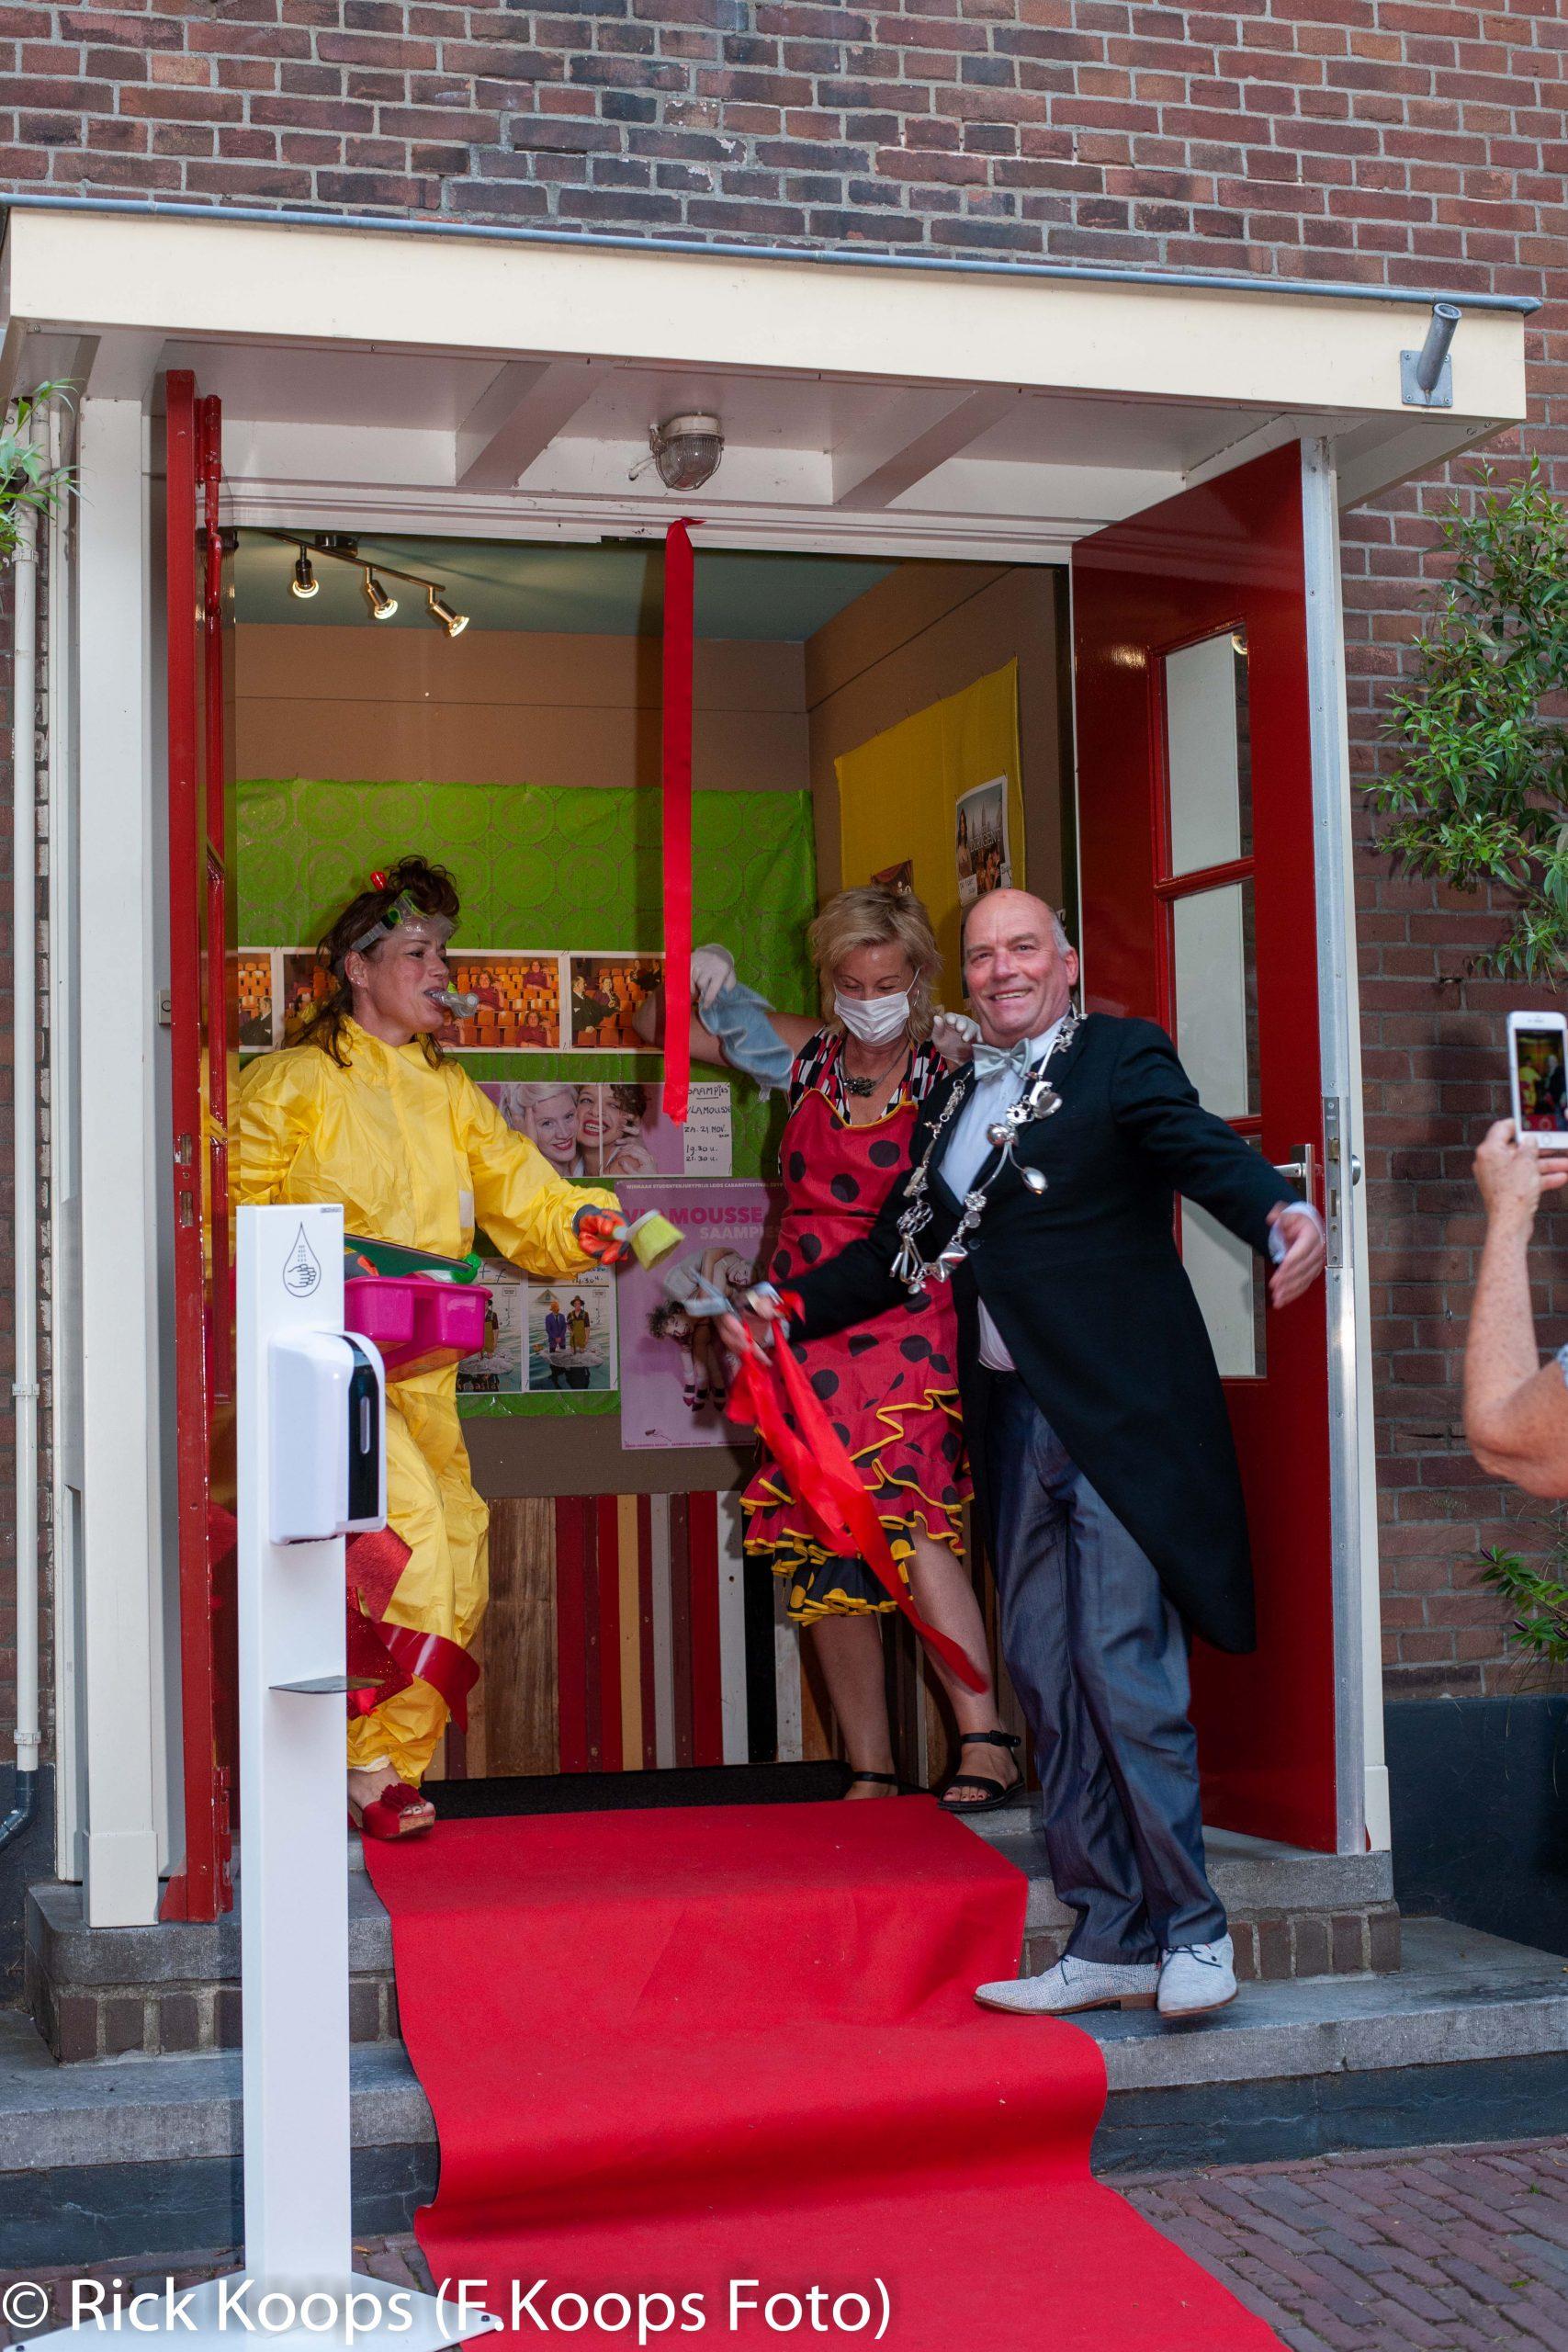 Nachtburgemeester opent nieuwe seizoen Arto Theater